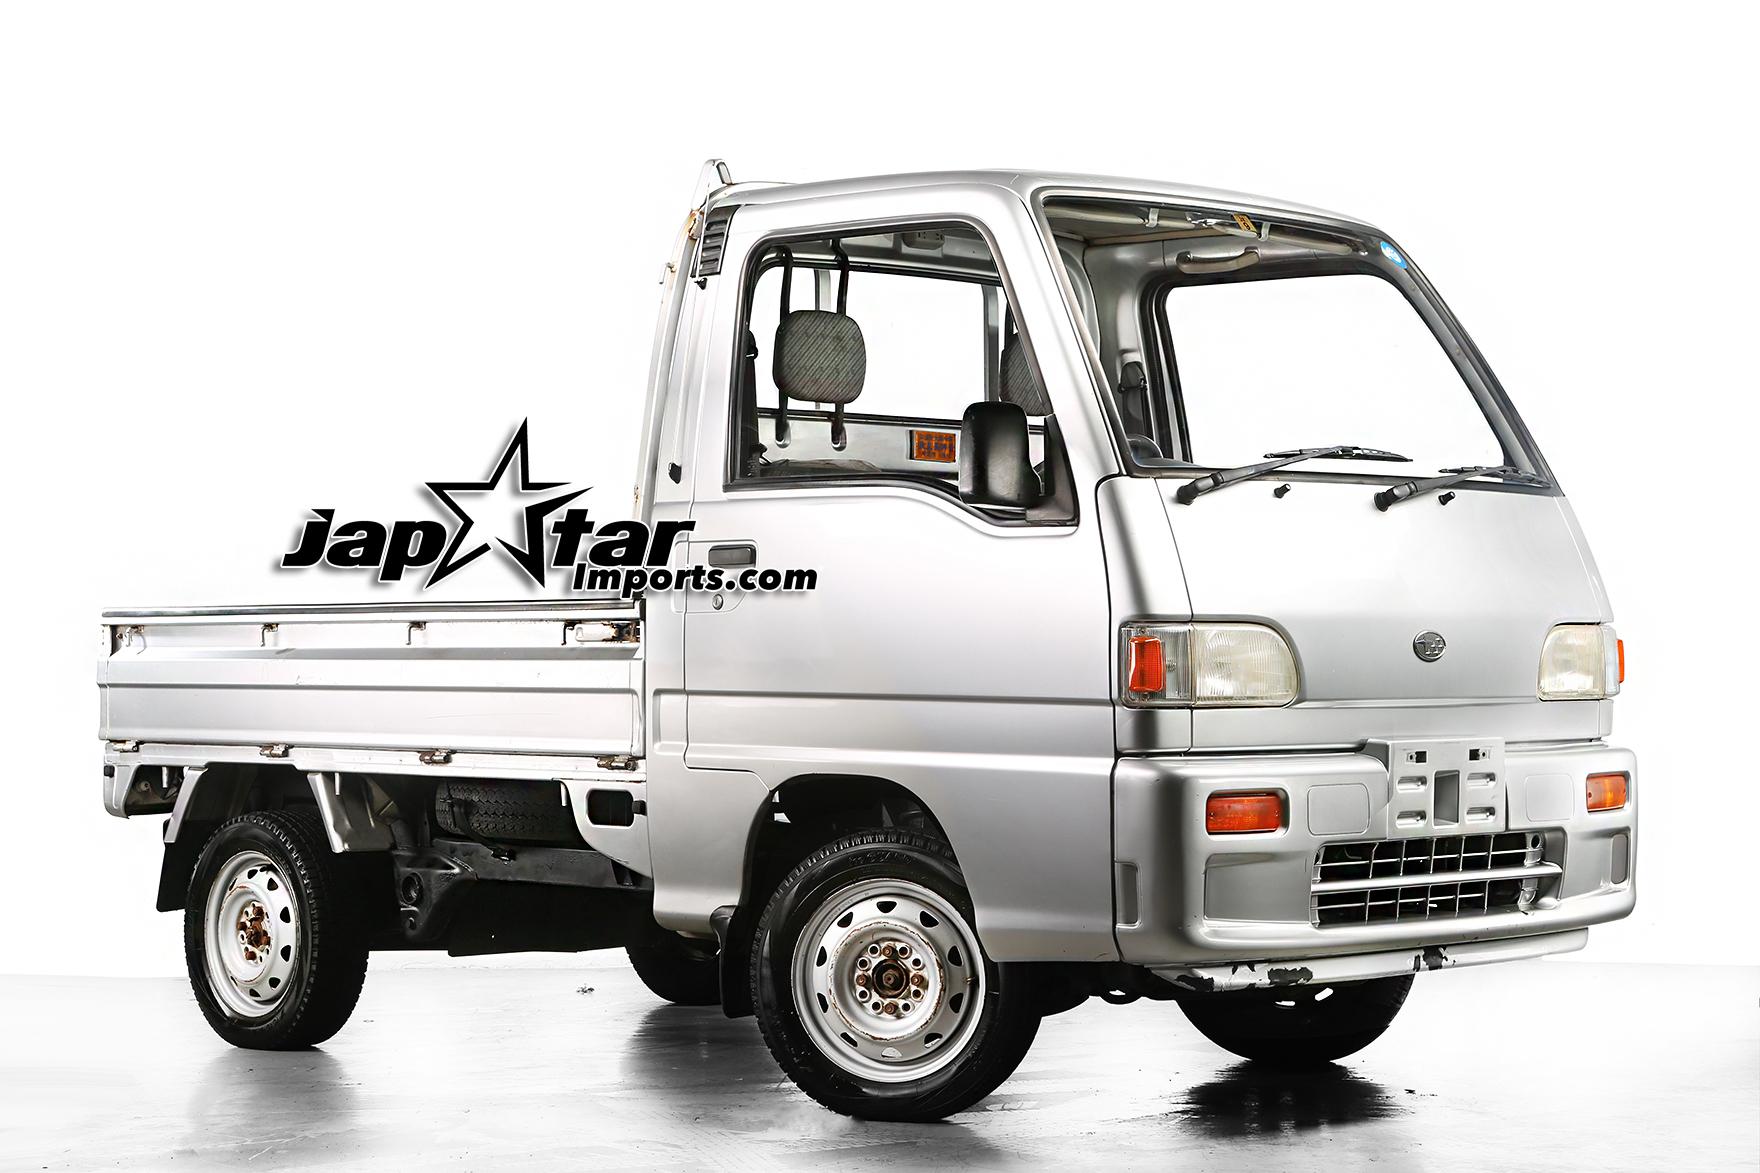 1992 Subaru Sambar Supercharged - SOLD